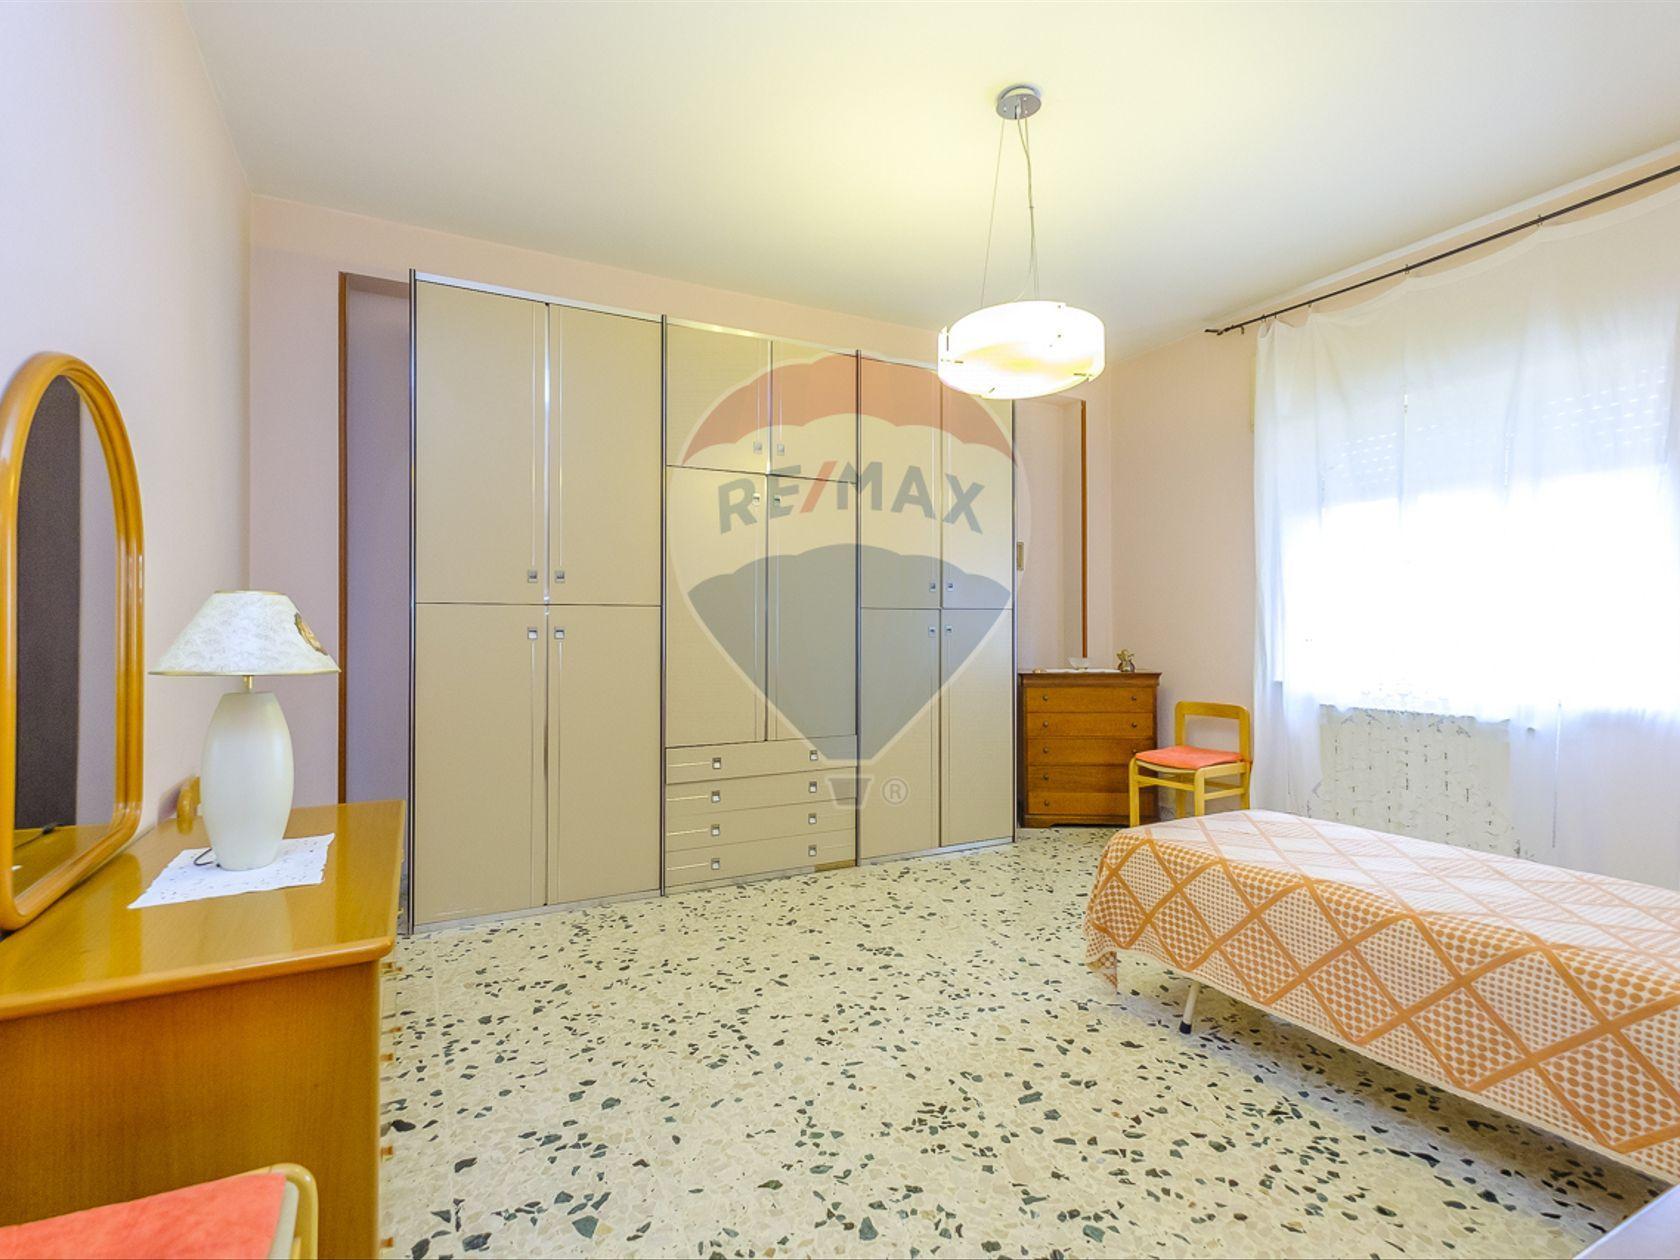 Appartamento Siracusa- Scala Greca S. Panagia Teracati Zecchino, Siracusa, SR Vendita - Foto 11